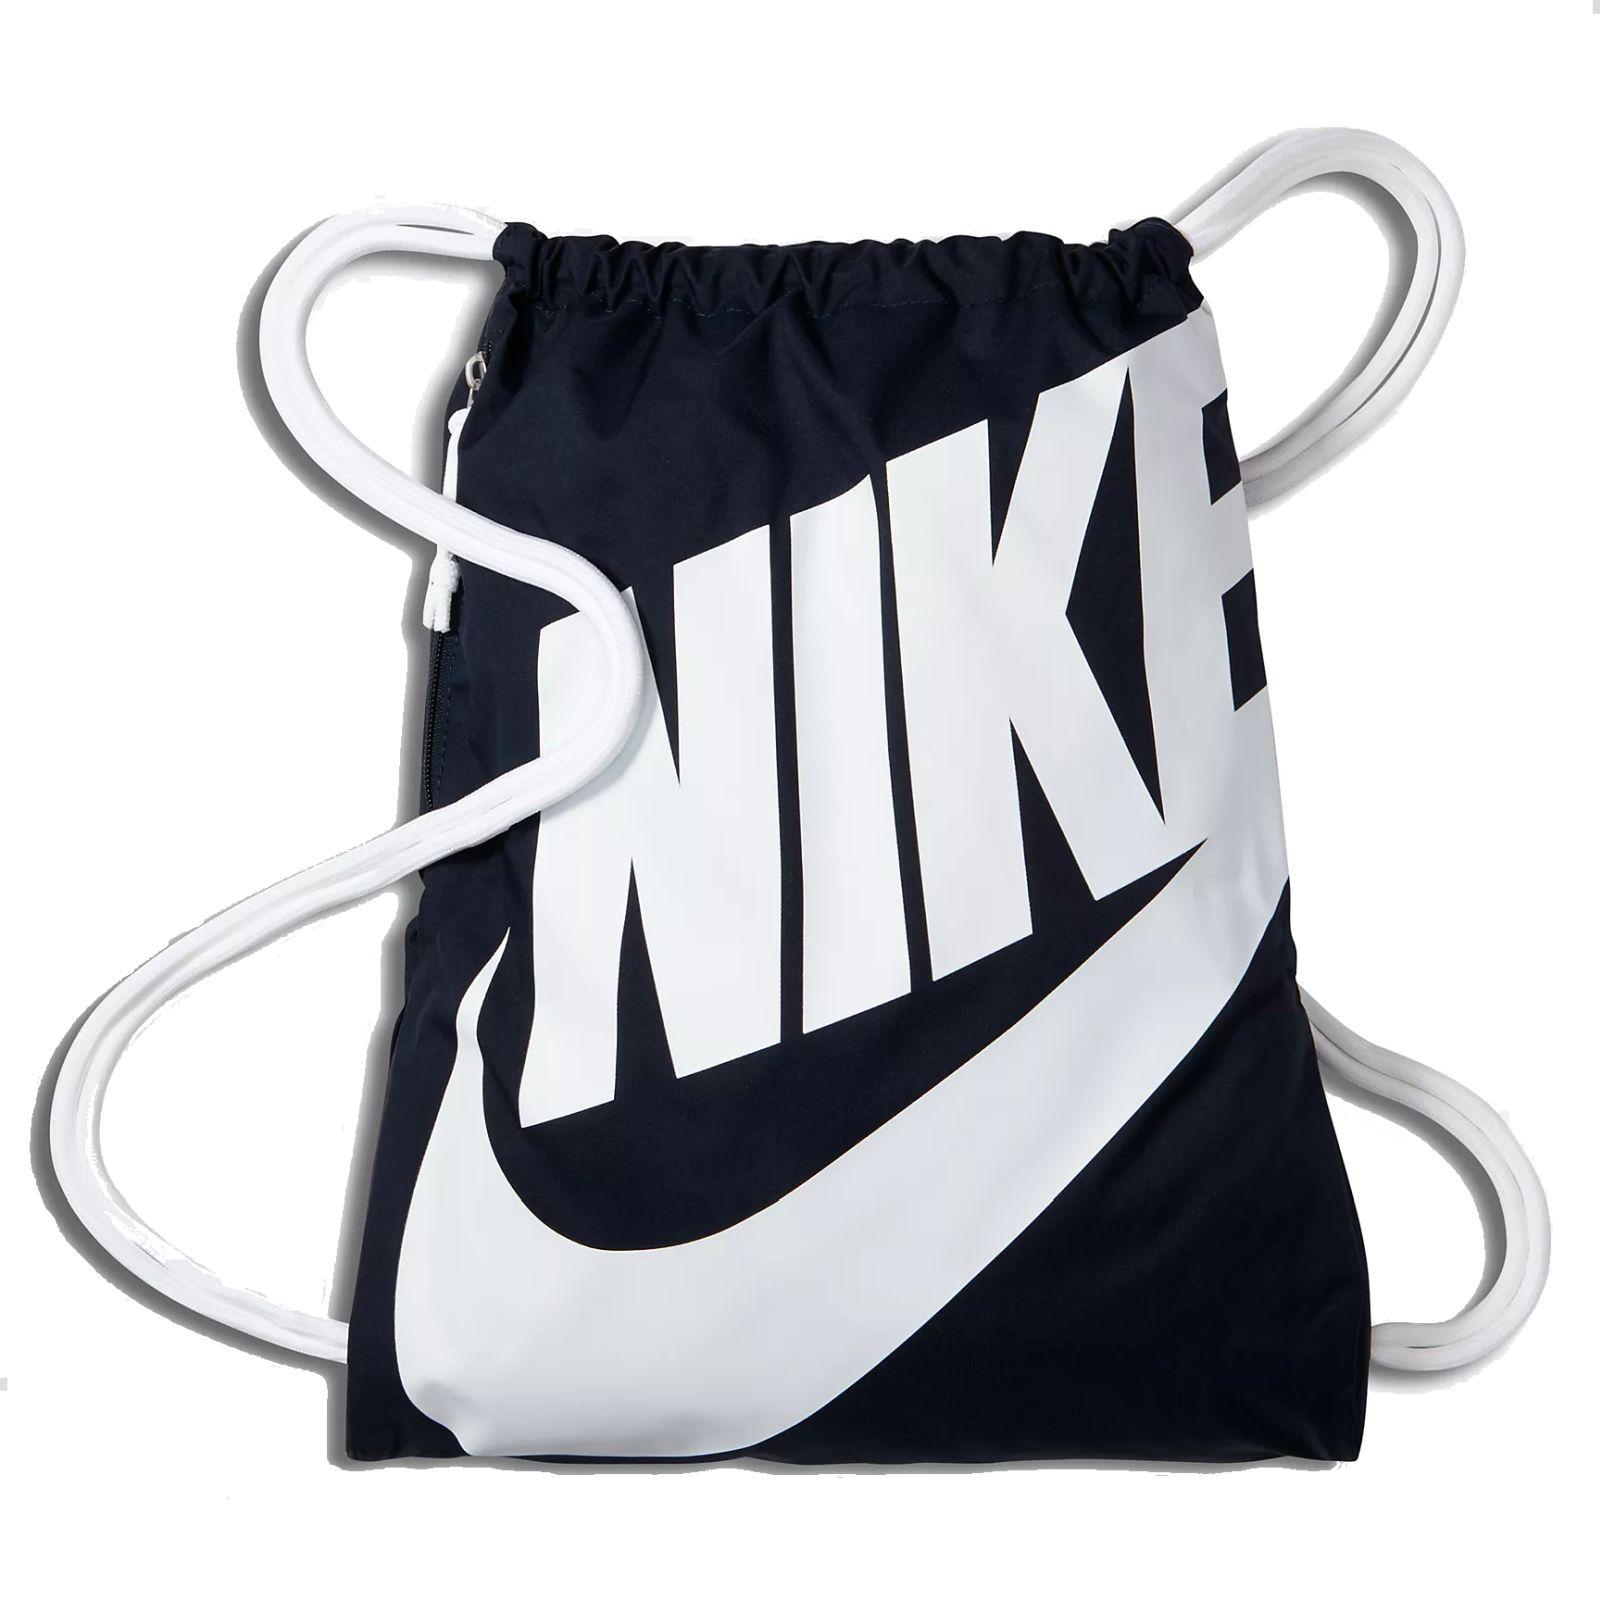 Details zu Nike Kinder Sportbeutel Gymbag NIKE HERITAGE GYMSACK obsidian  blau weiß